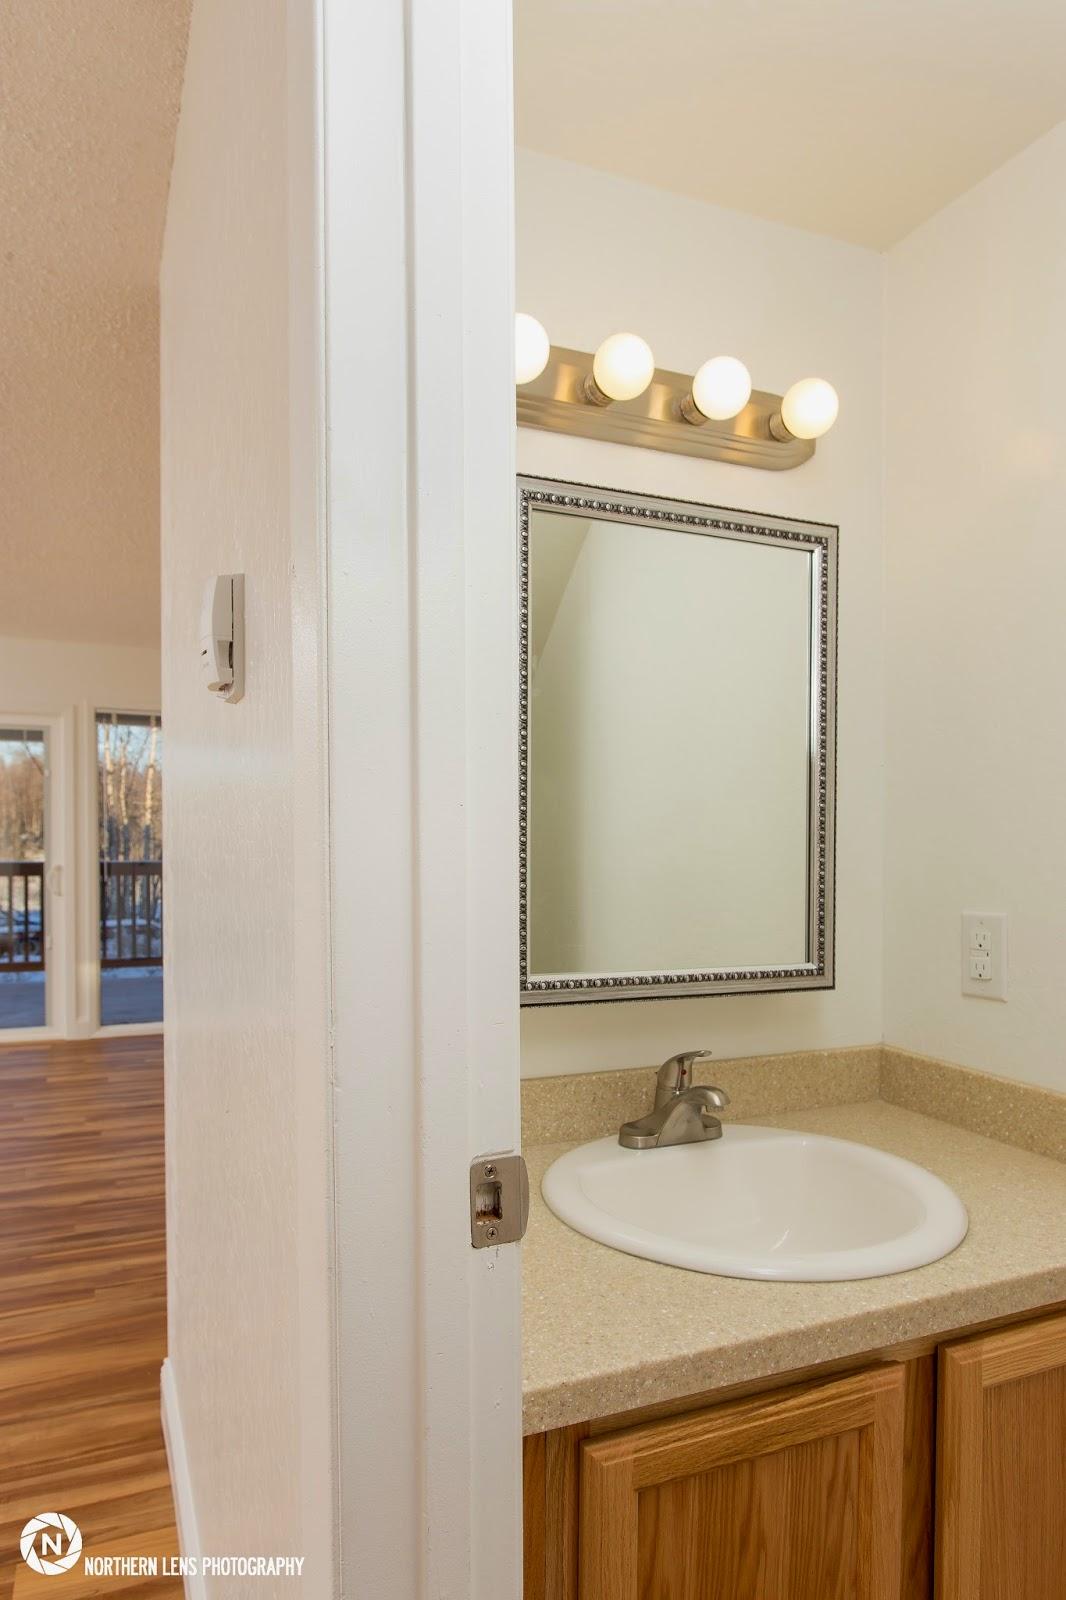 Interior Anchorage Alaska Real Estate Photographer Contractor Remodel Designer